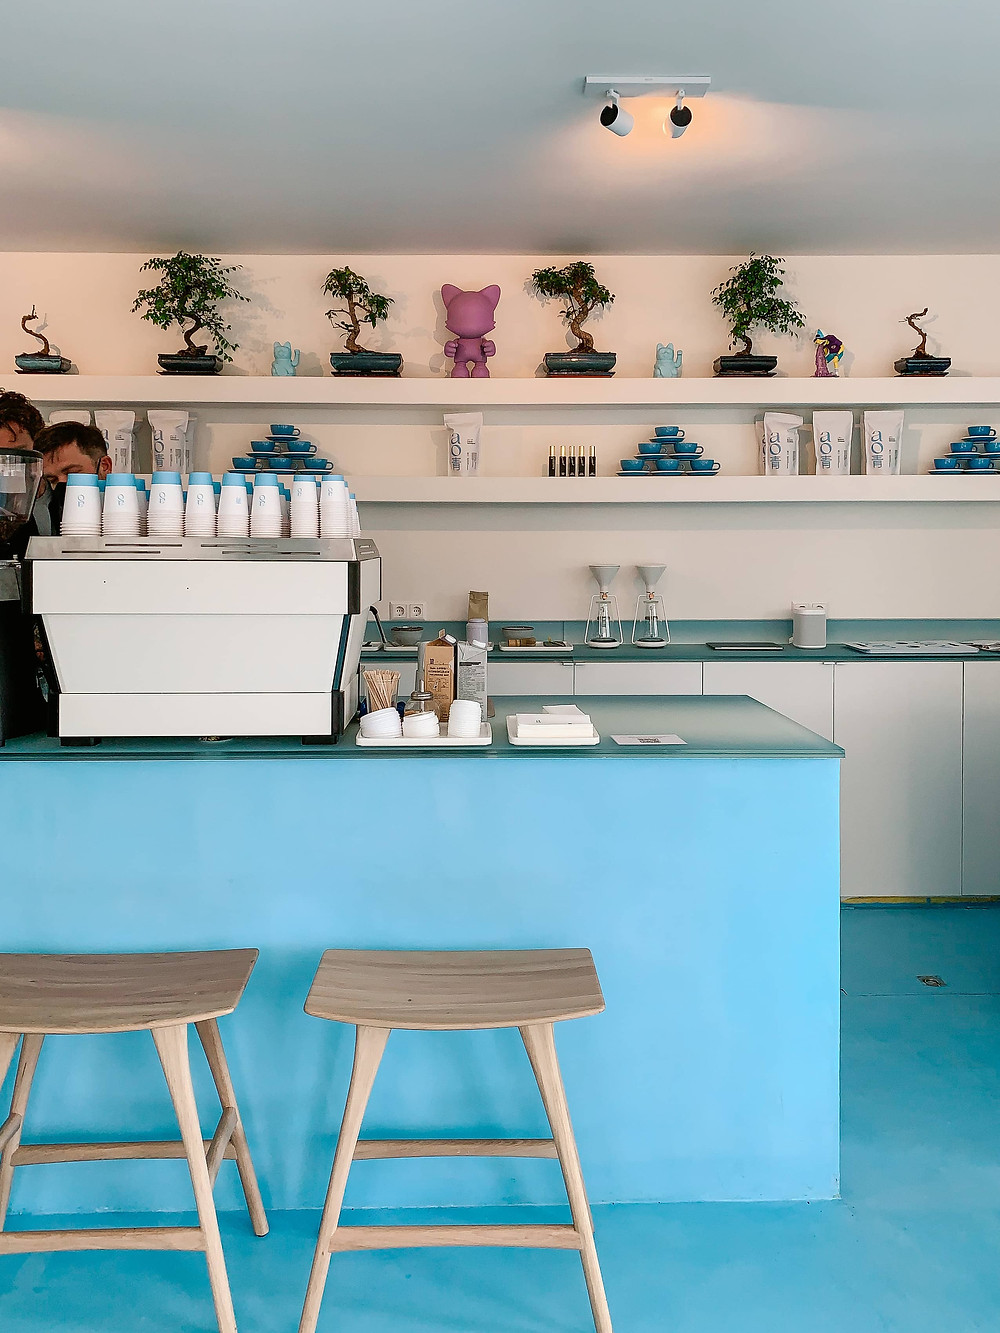 amsterdam coffee places list 2021